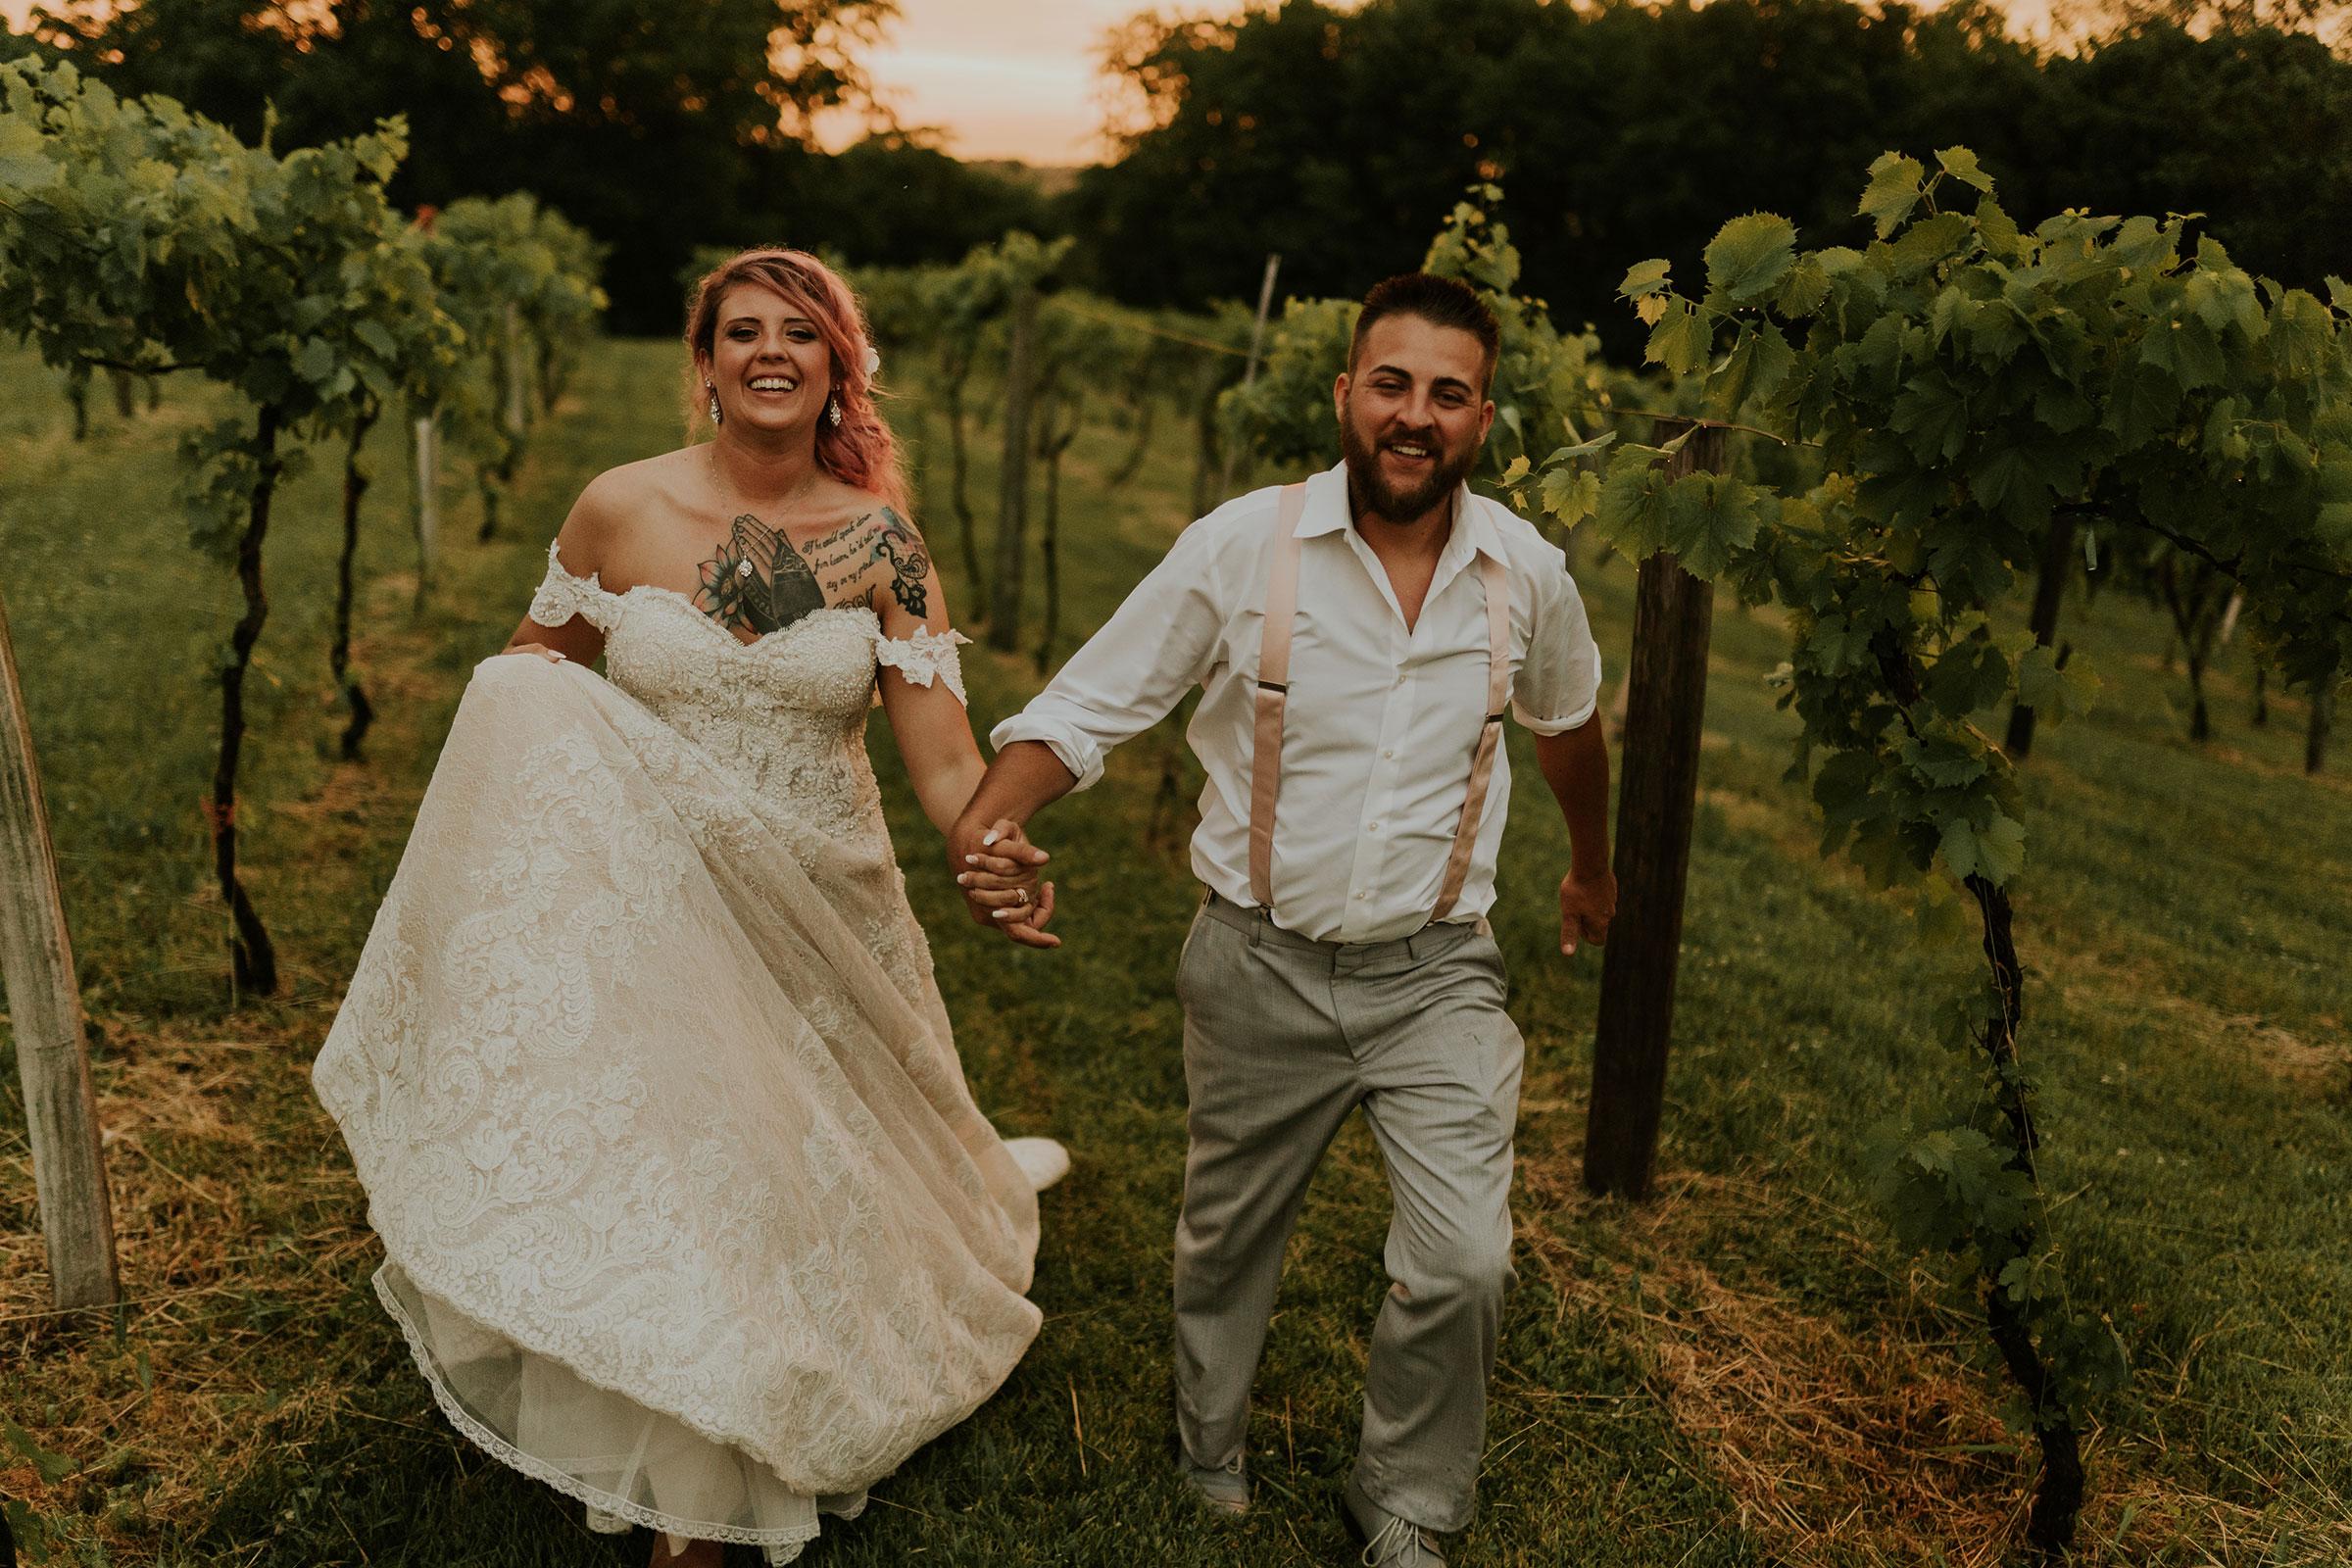 bride-groom-running-at-sunset-in-vineyard-wedding-summerset-winery-indianola-iowa-raelyn-ramey-photography.jpg